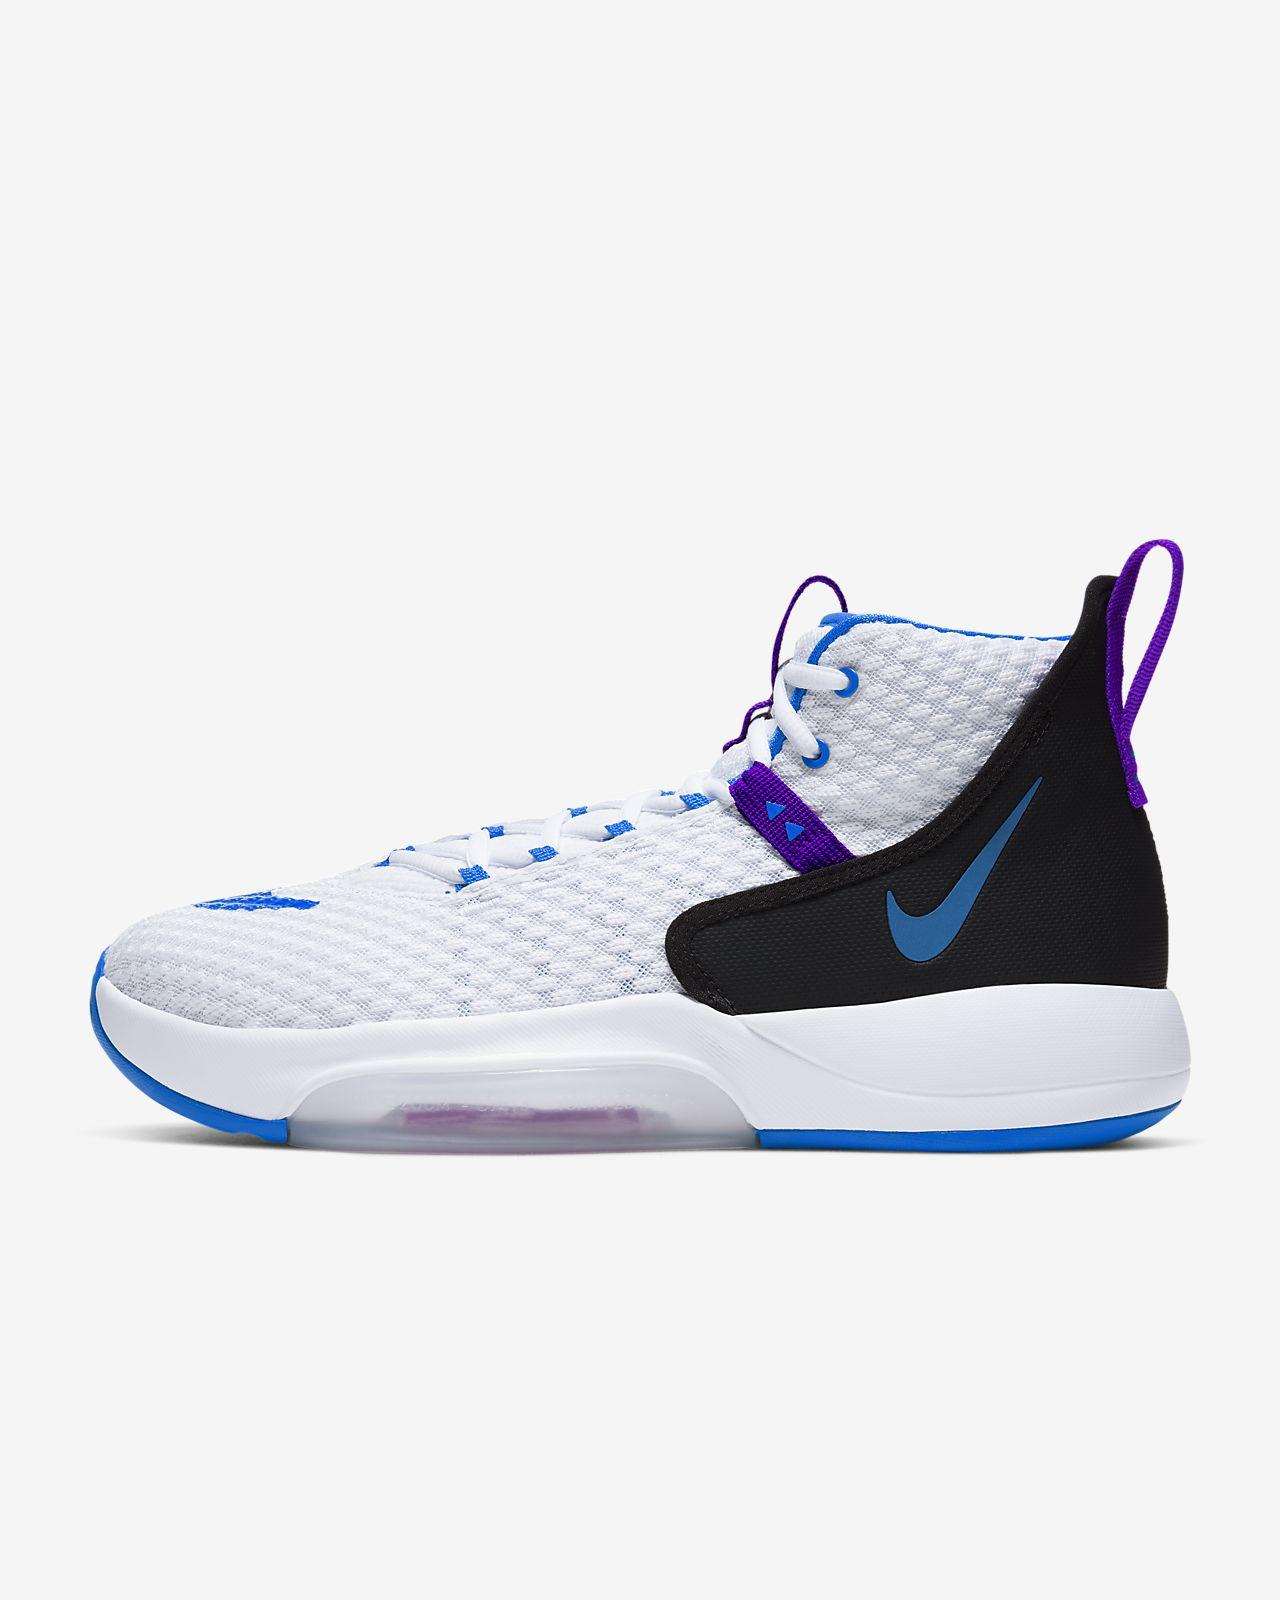 Nike Zoom Rize Basketballschuh